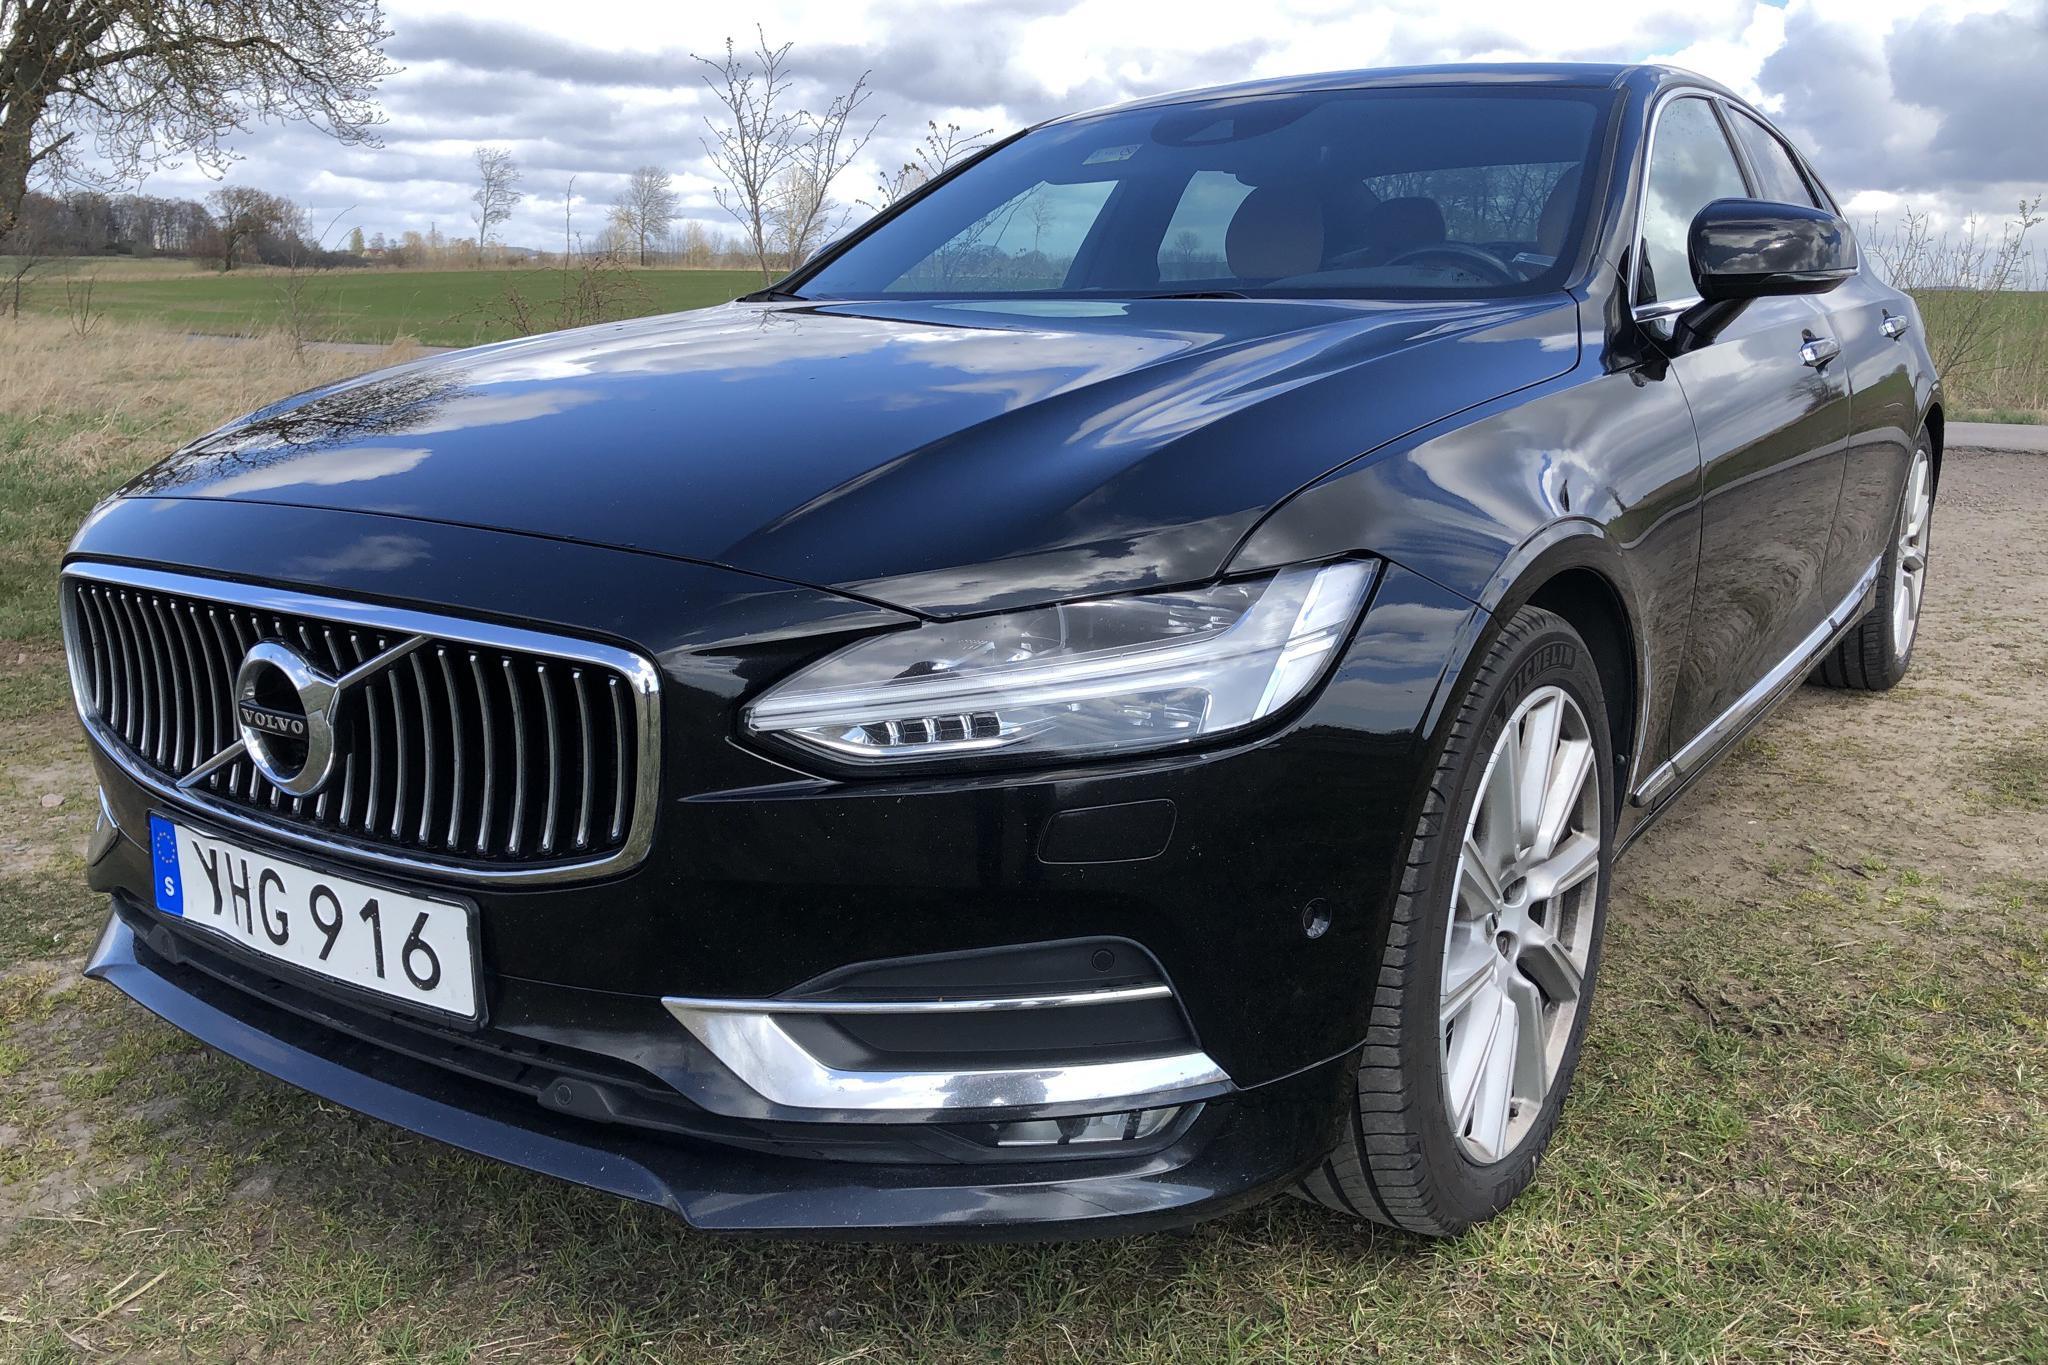 Volvo S90 D5 AWD (235hk) - 16 569 mil - Automat - svart - 2017